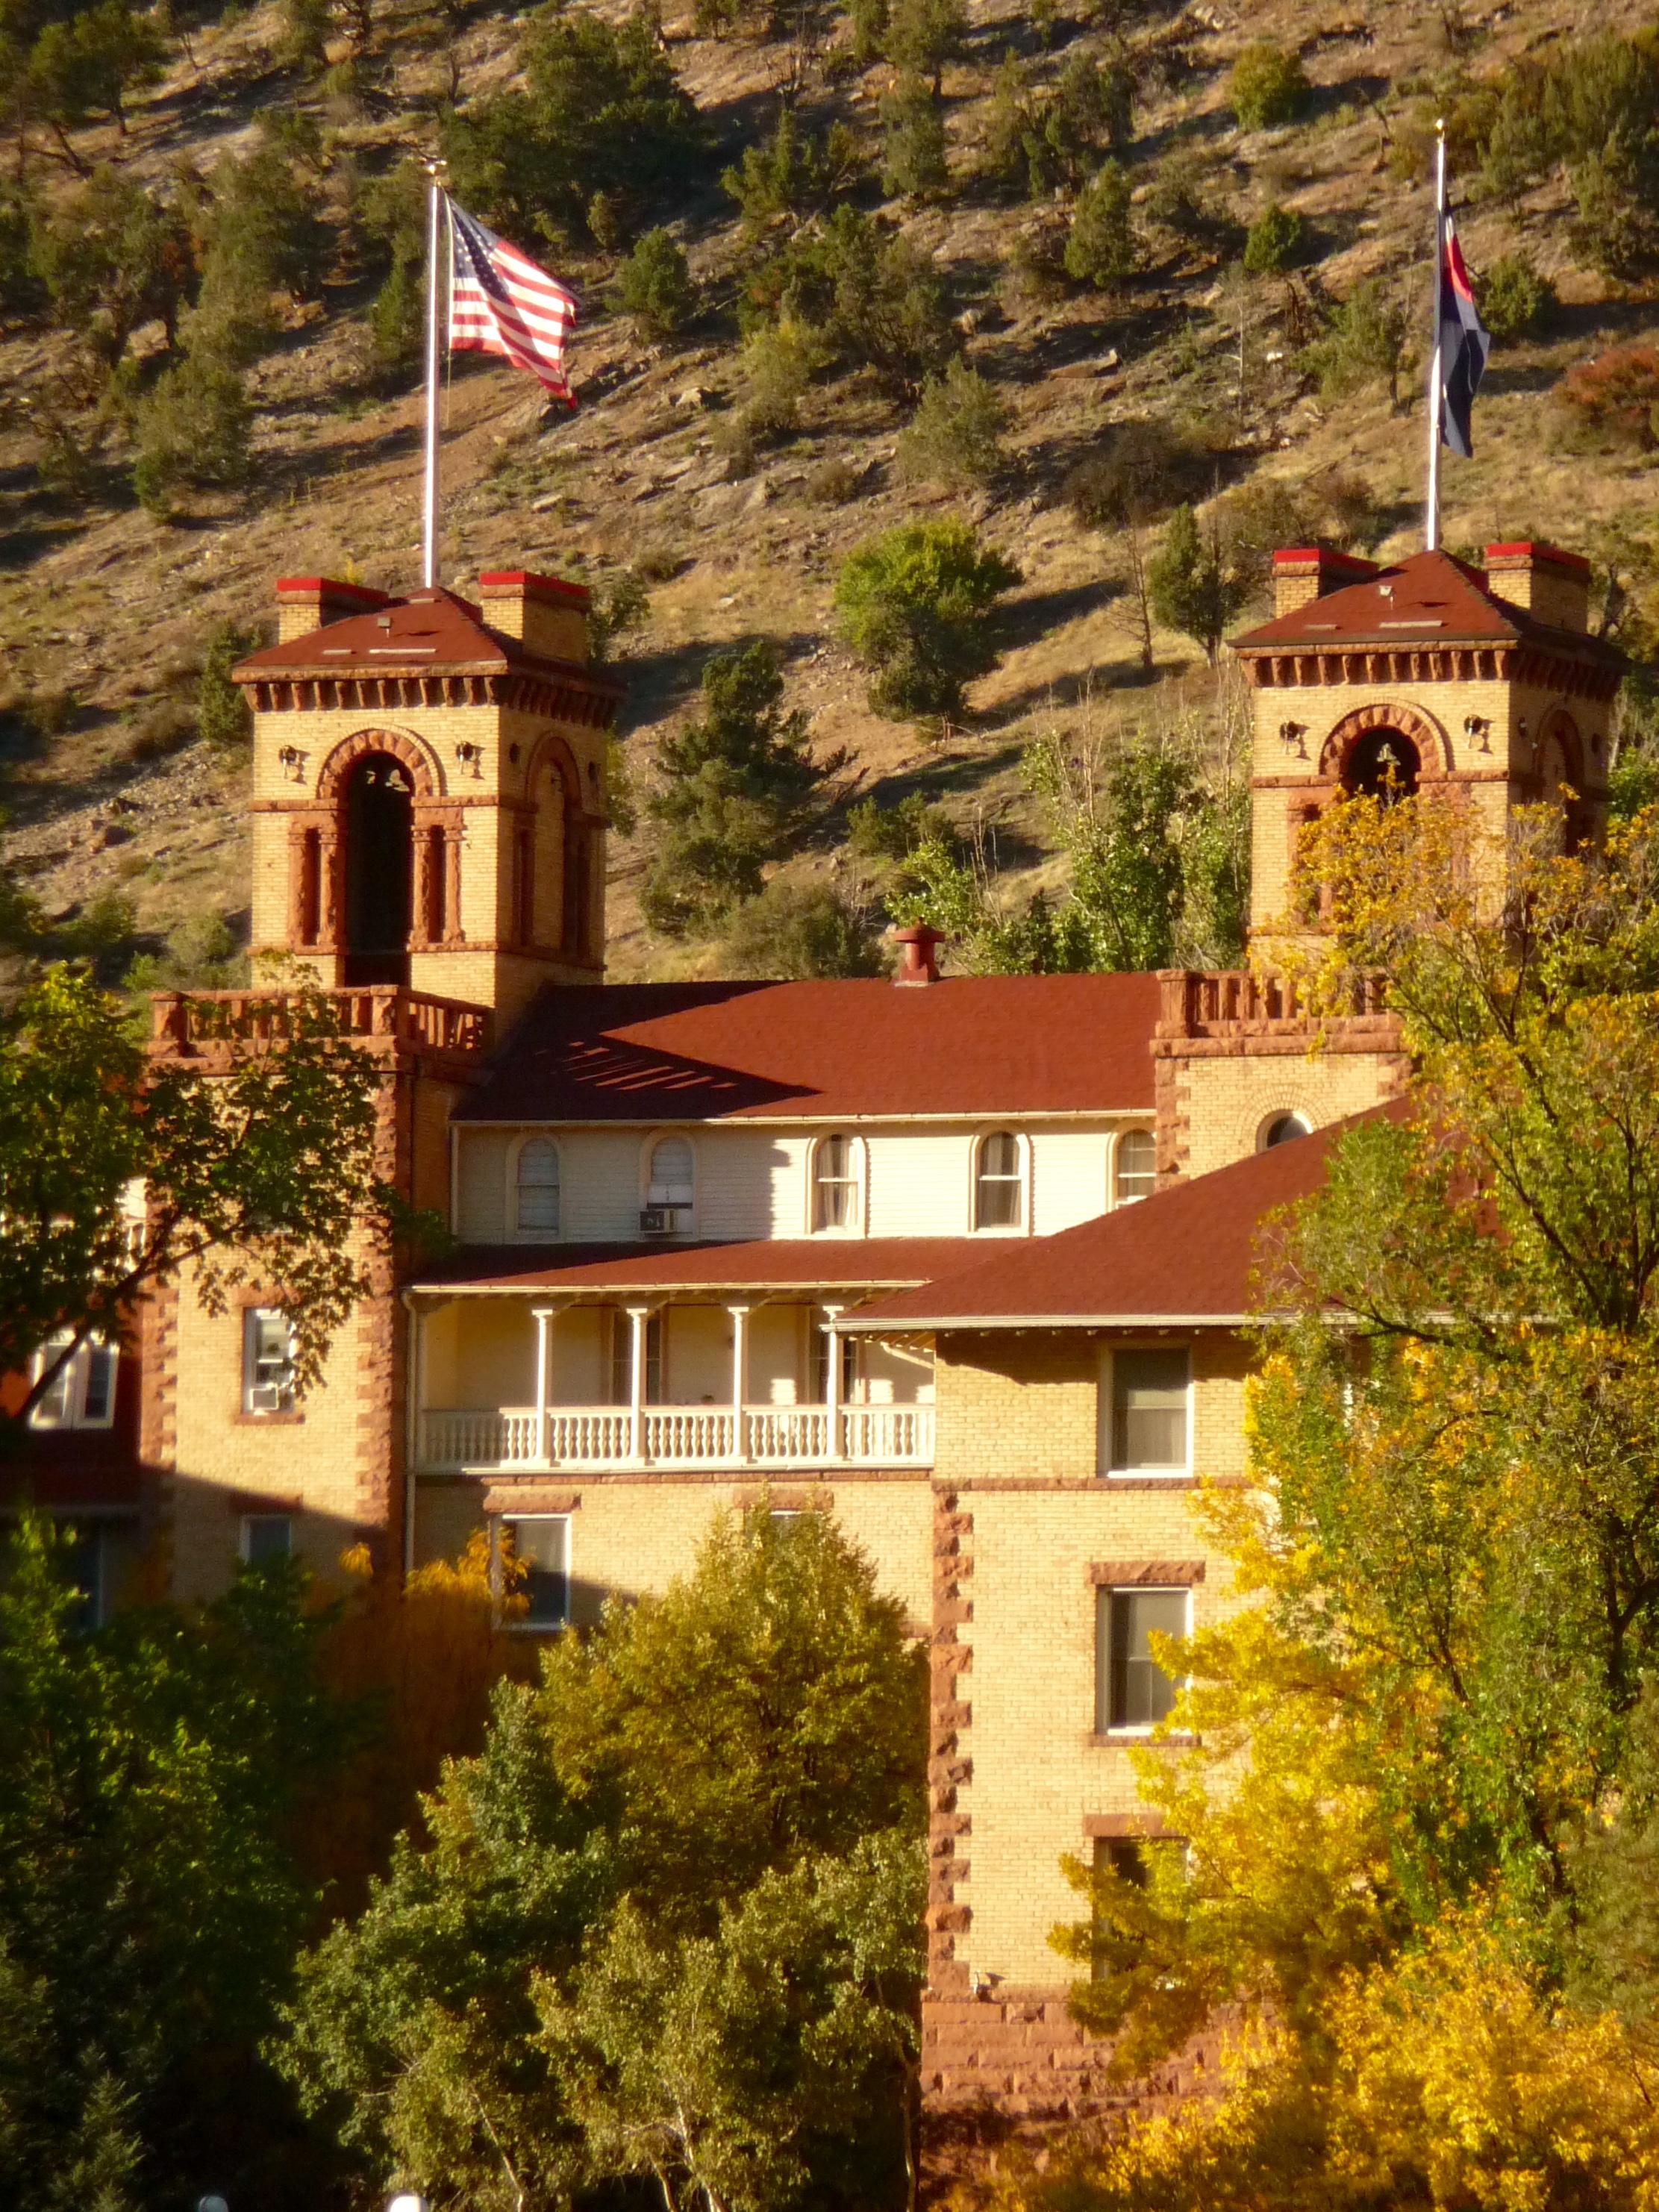 Glenwood Springs Elevation : Elevation of glenwood springs co usa maplogs